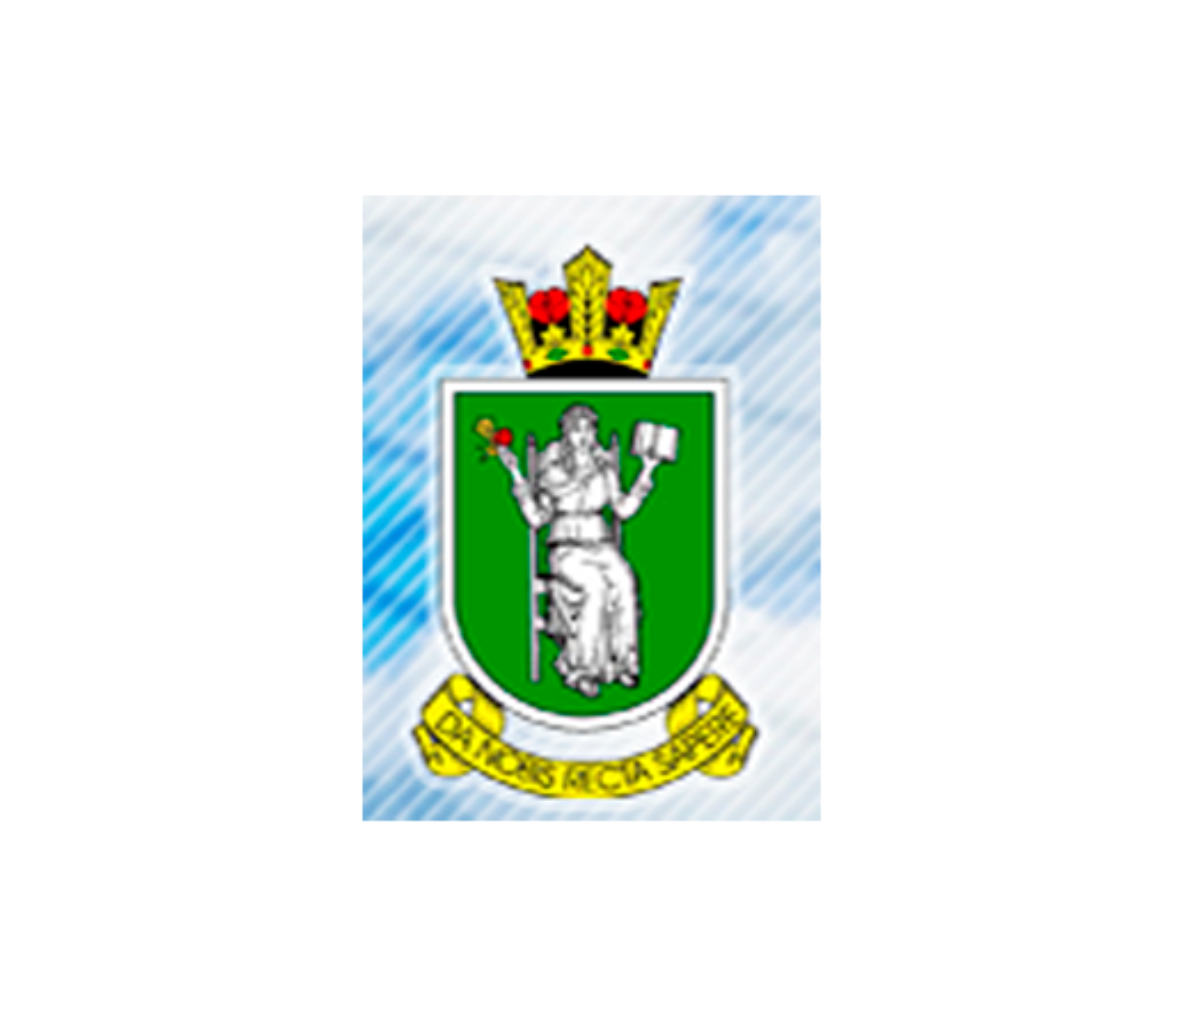 State Agrirain University of Moldova